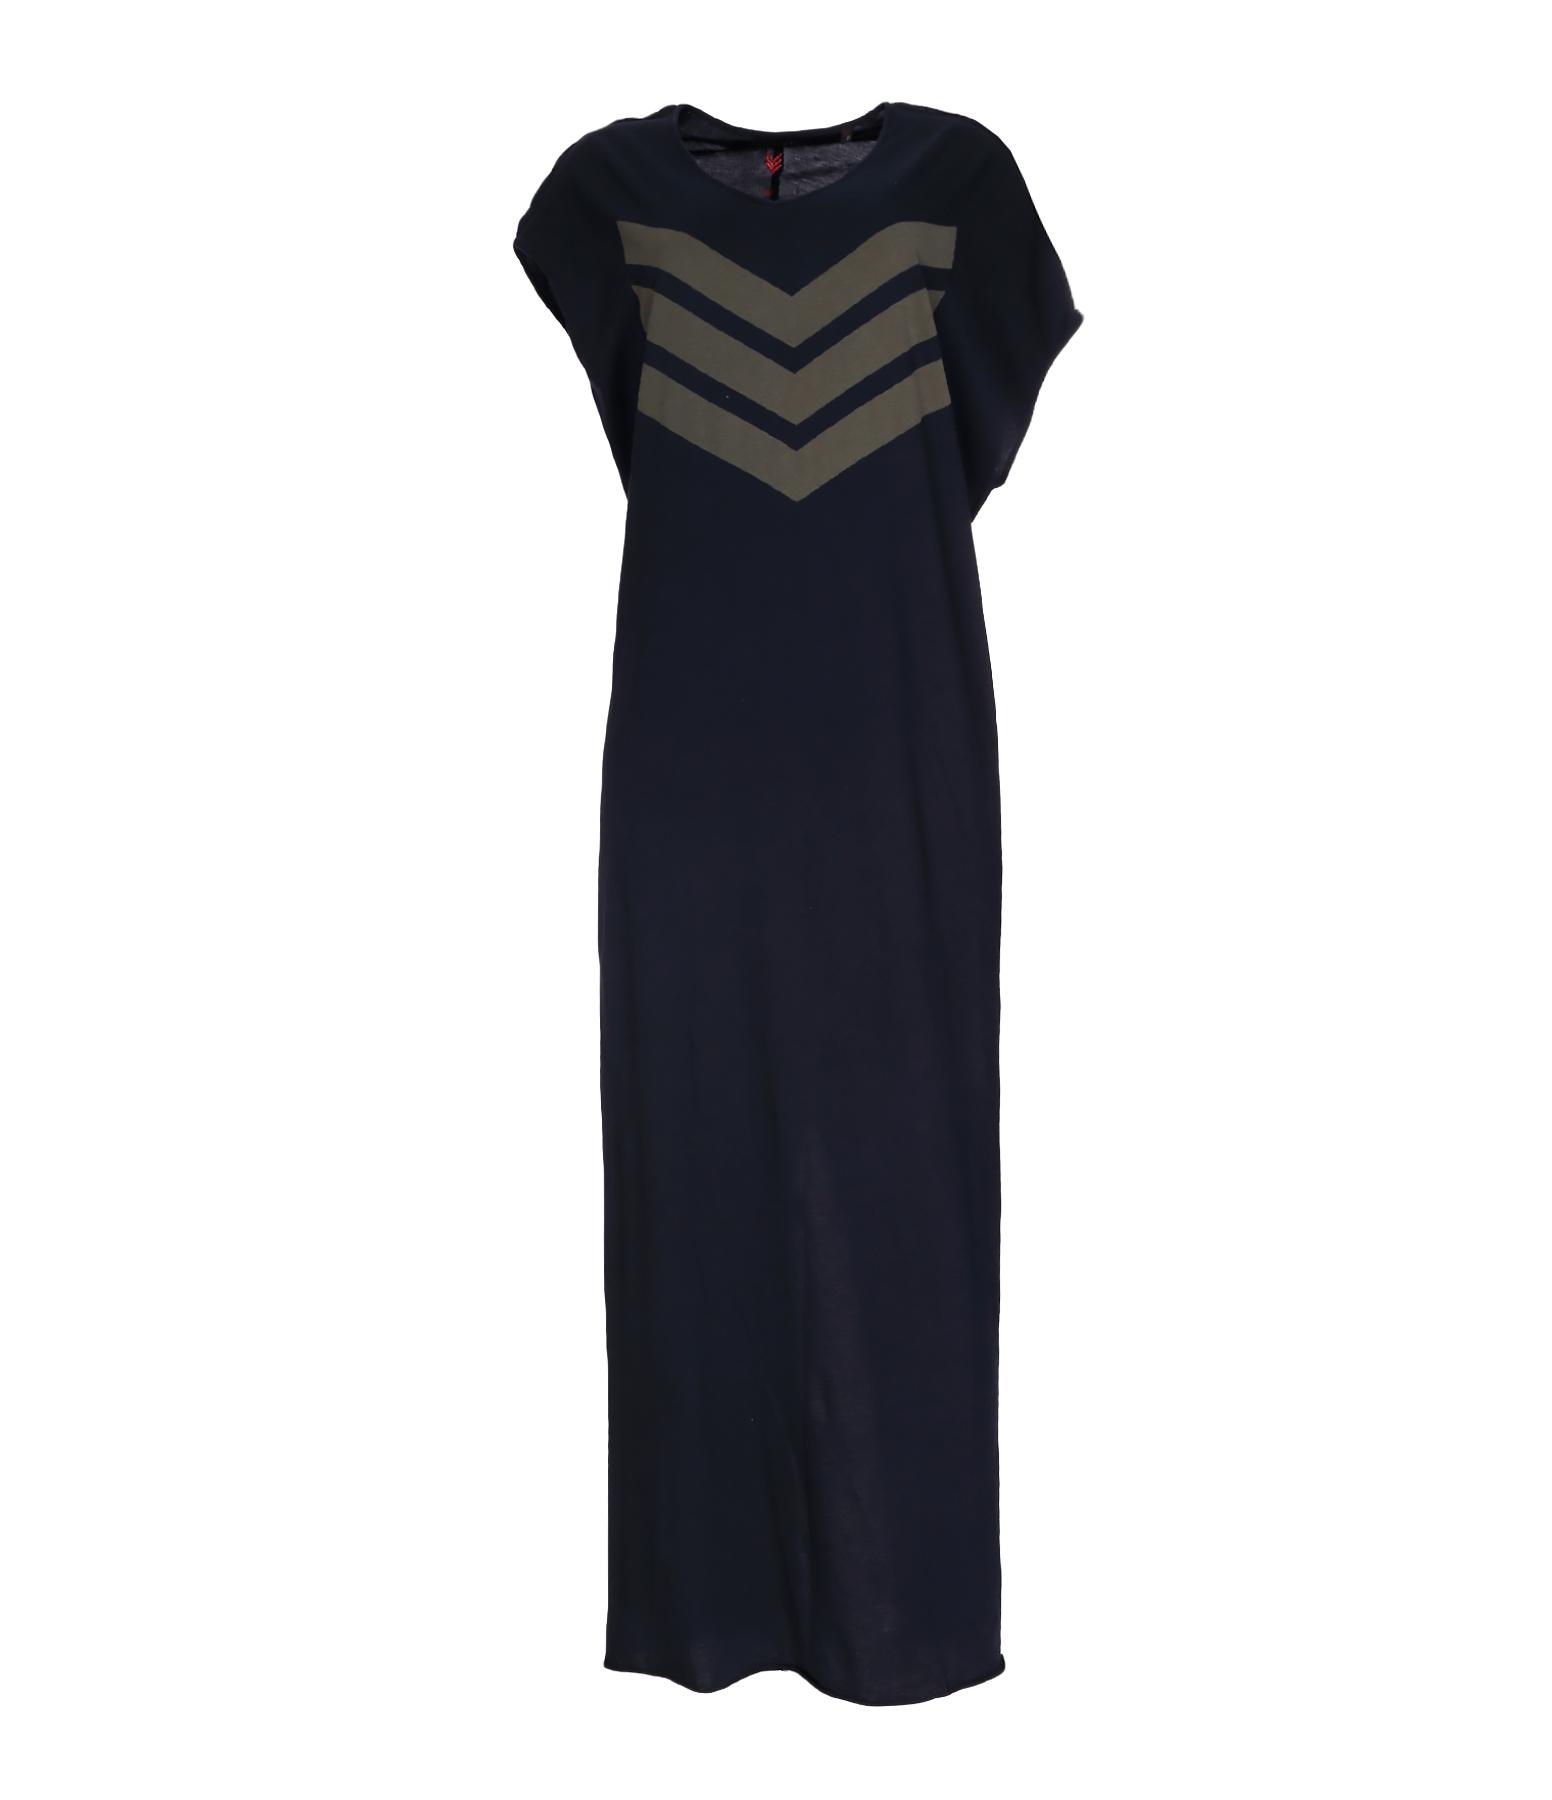 Robe Erin Exclu Lulli Coton Noir